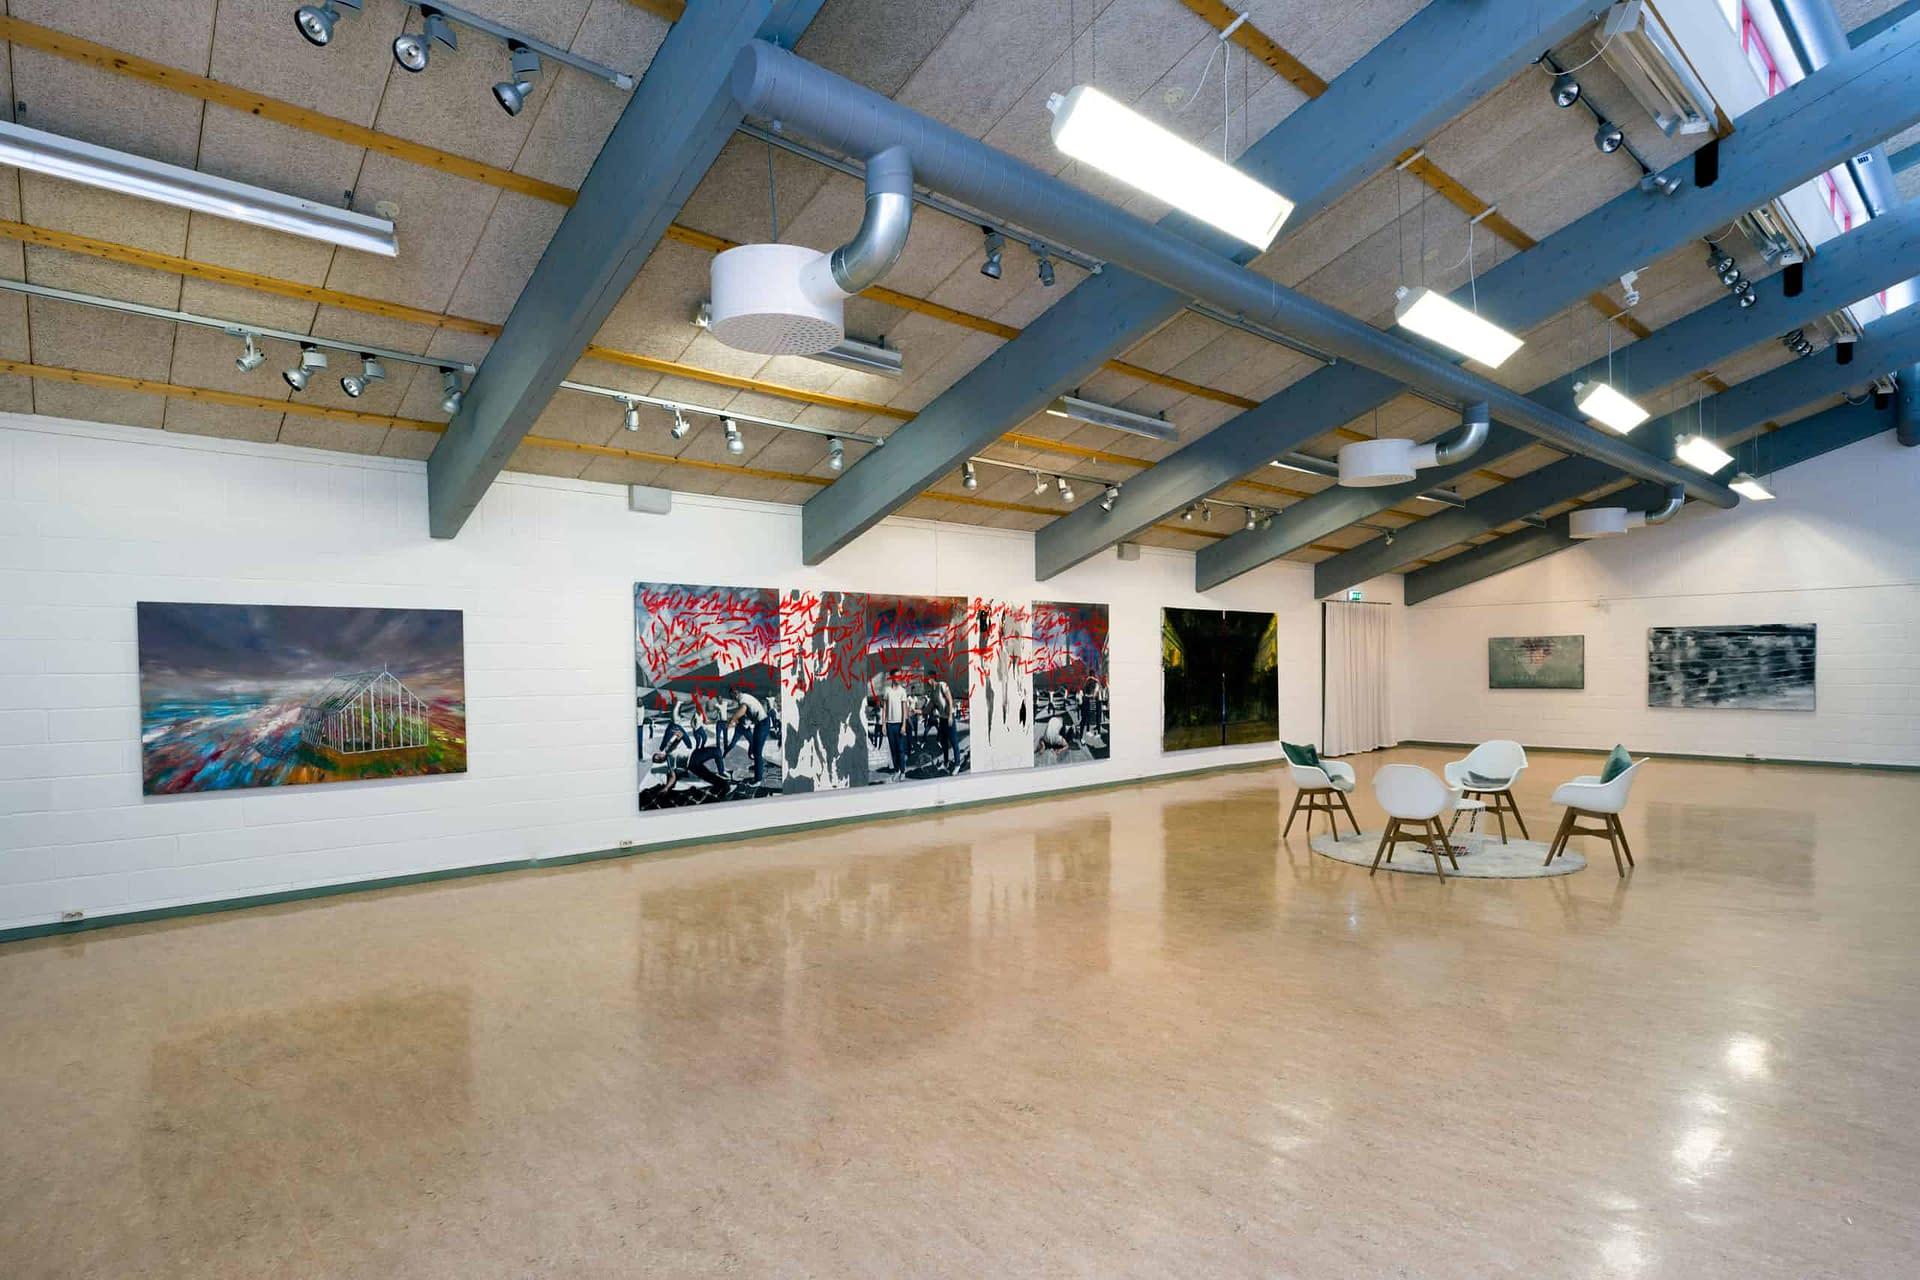 Exhibition by Erik Sigerud